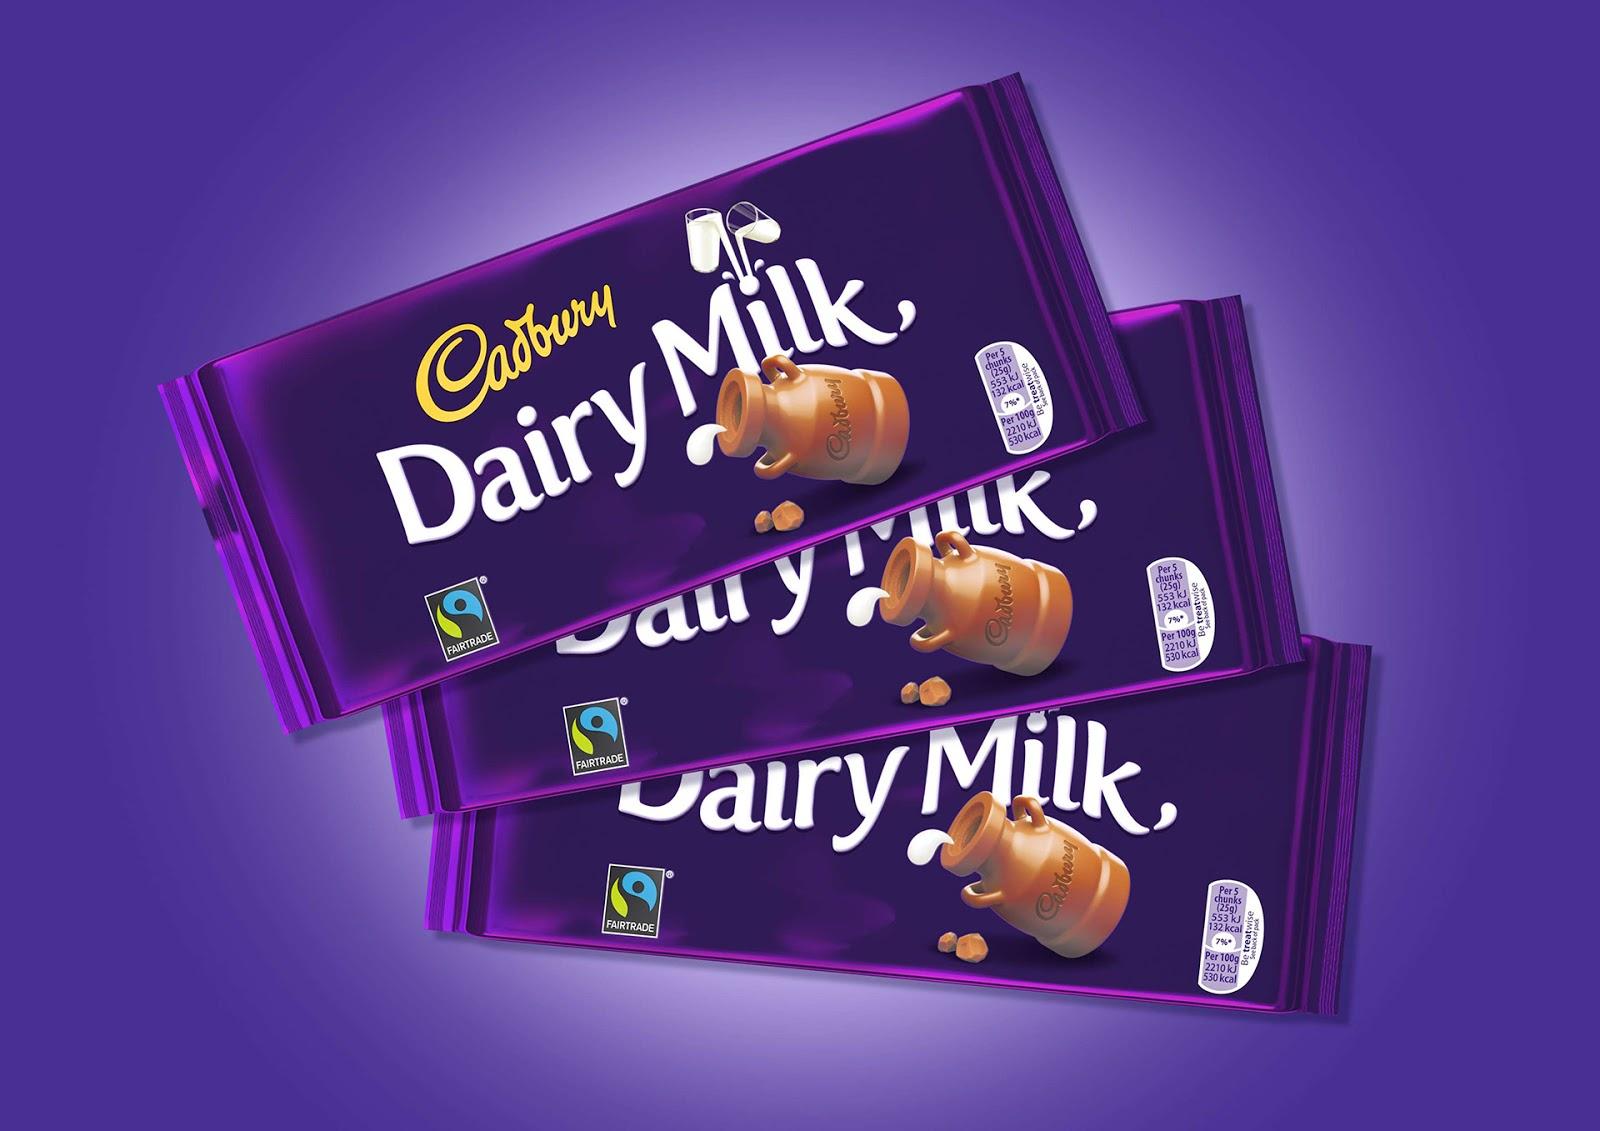 All hd wallpapers cadbury dairy milk wallpapers dairy milk wallpaper free download thecheapjerseys Choice Image